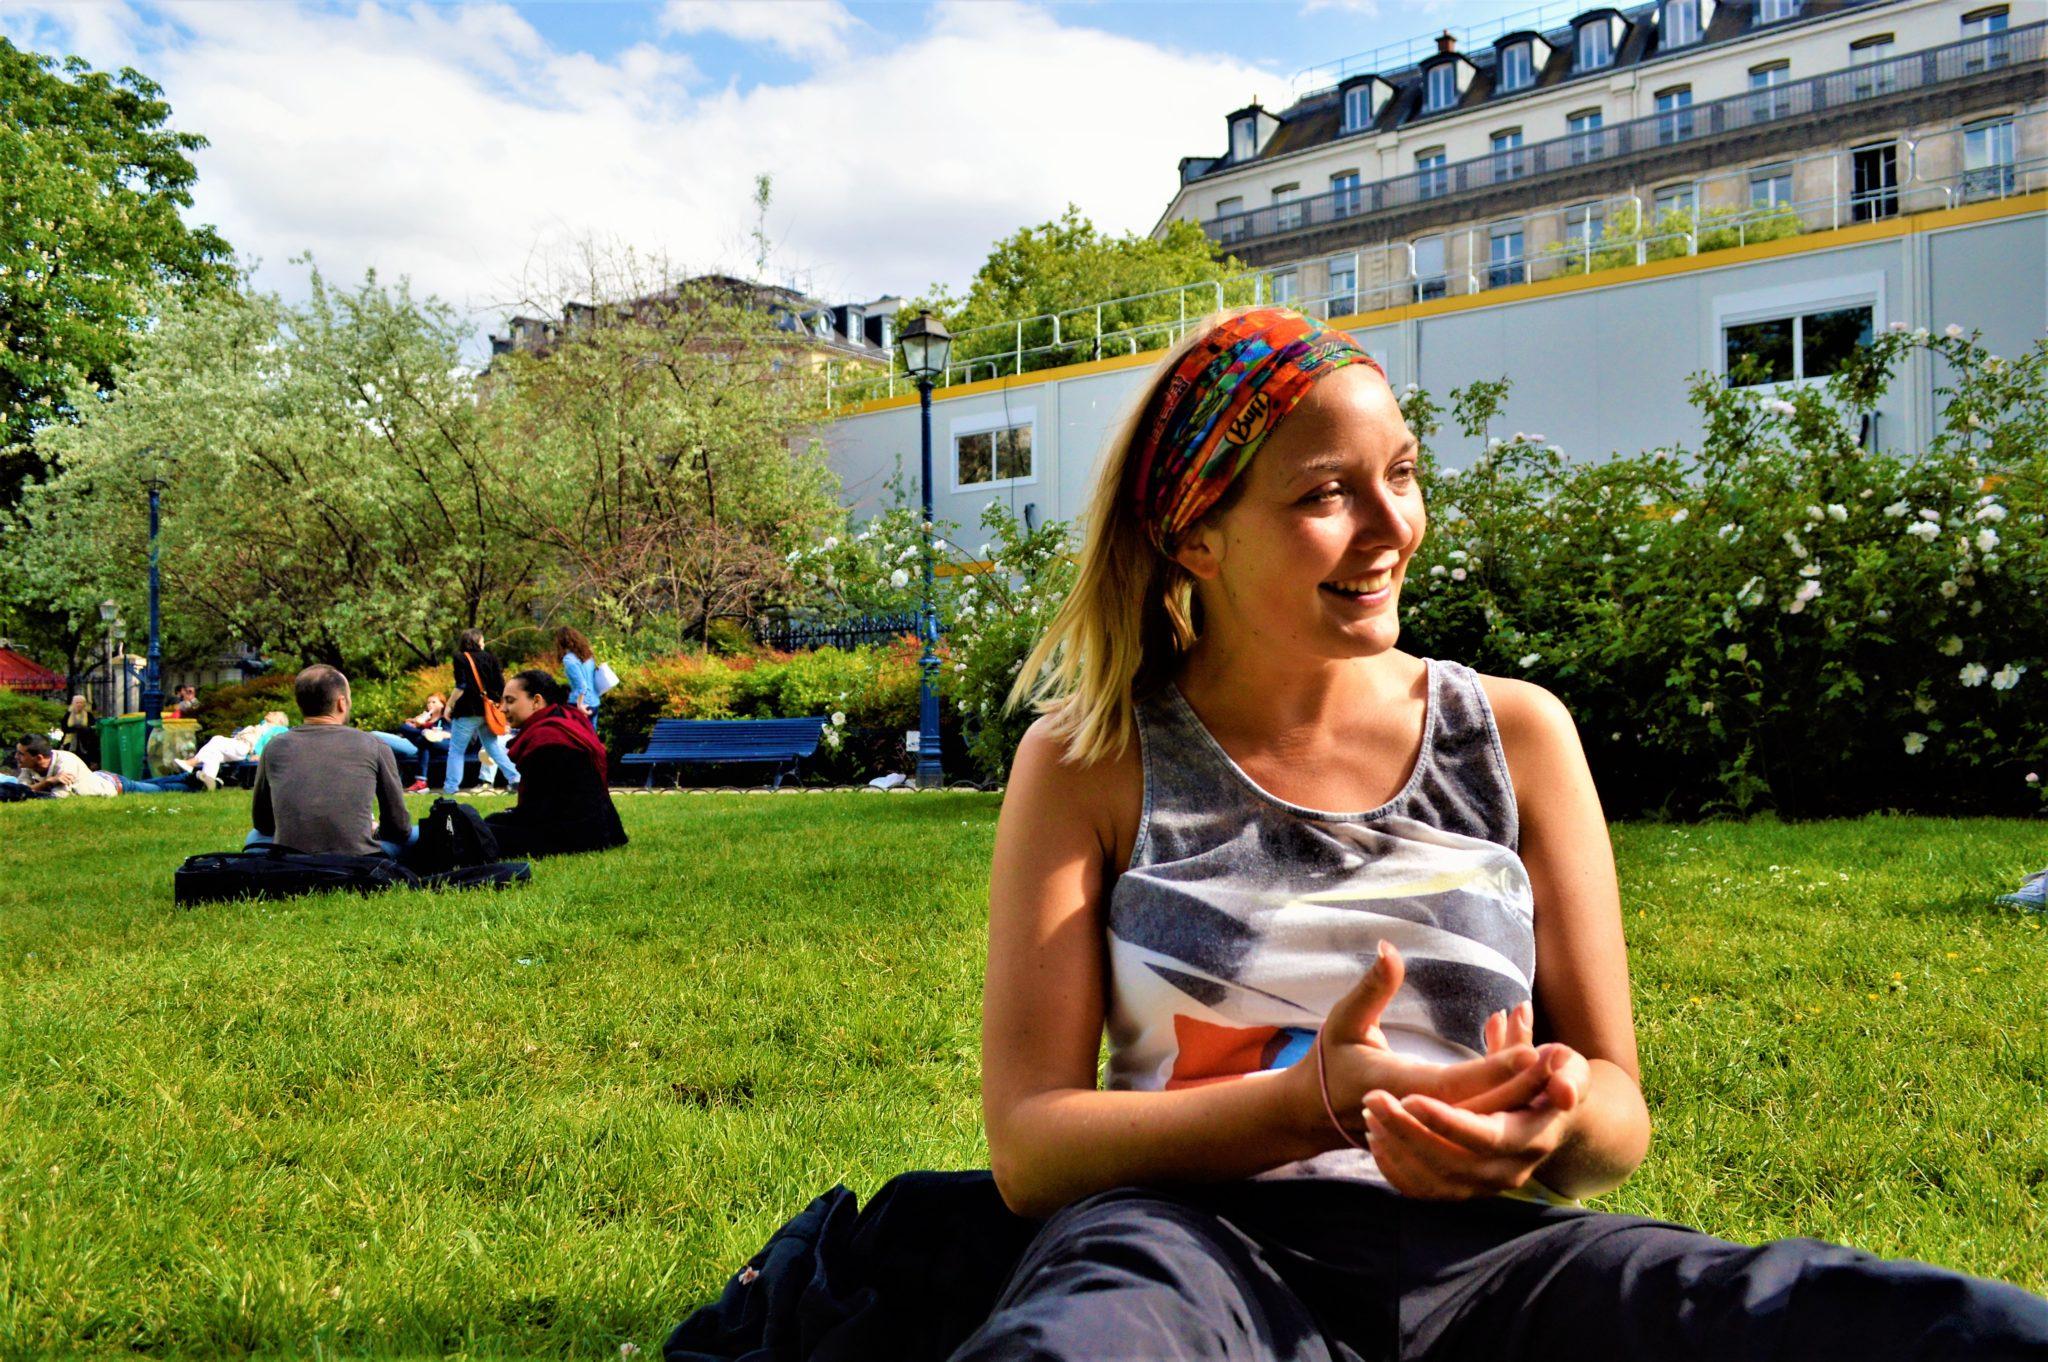 Nicola enjoying picnic, Paris, France